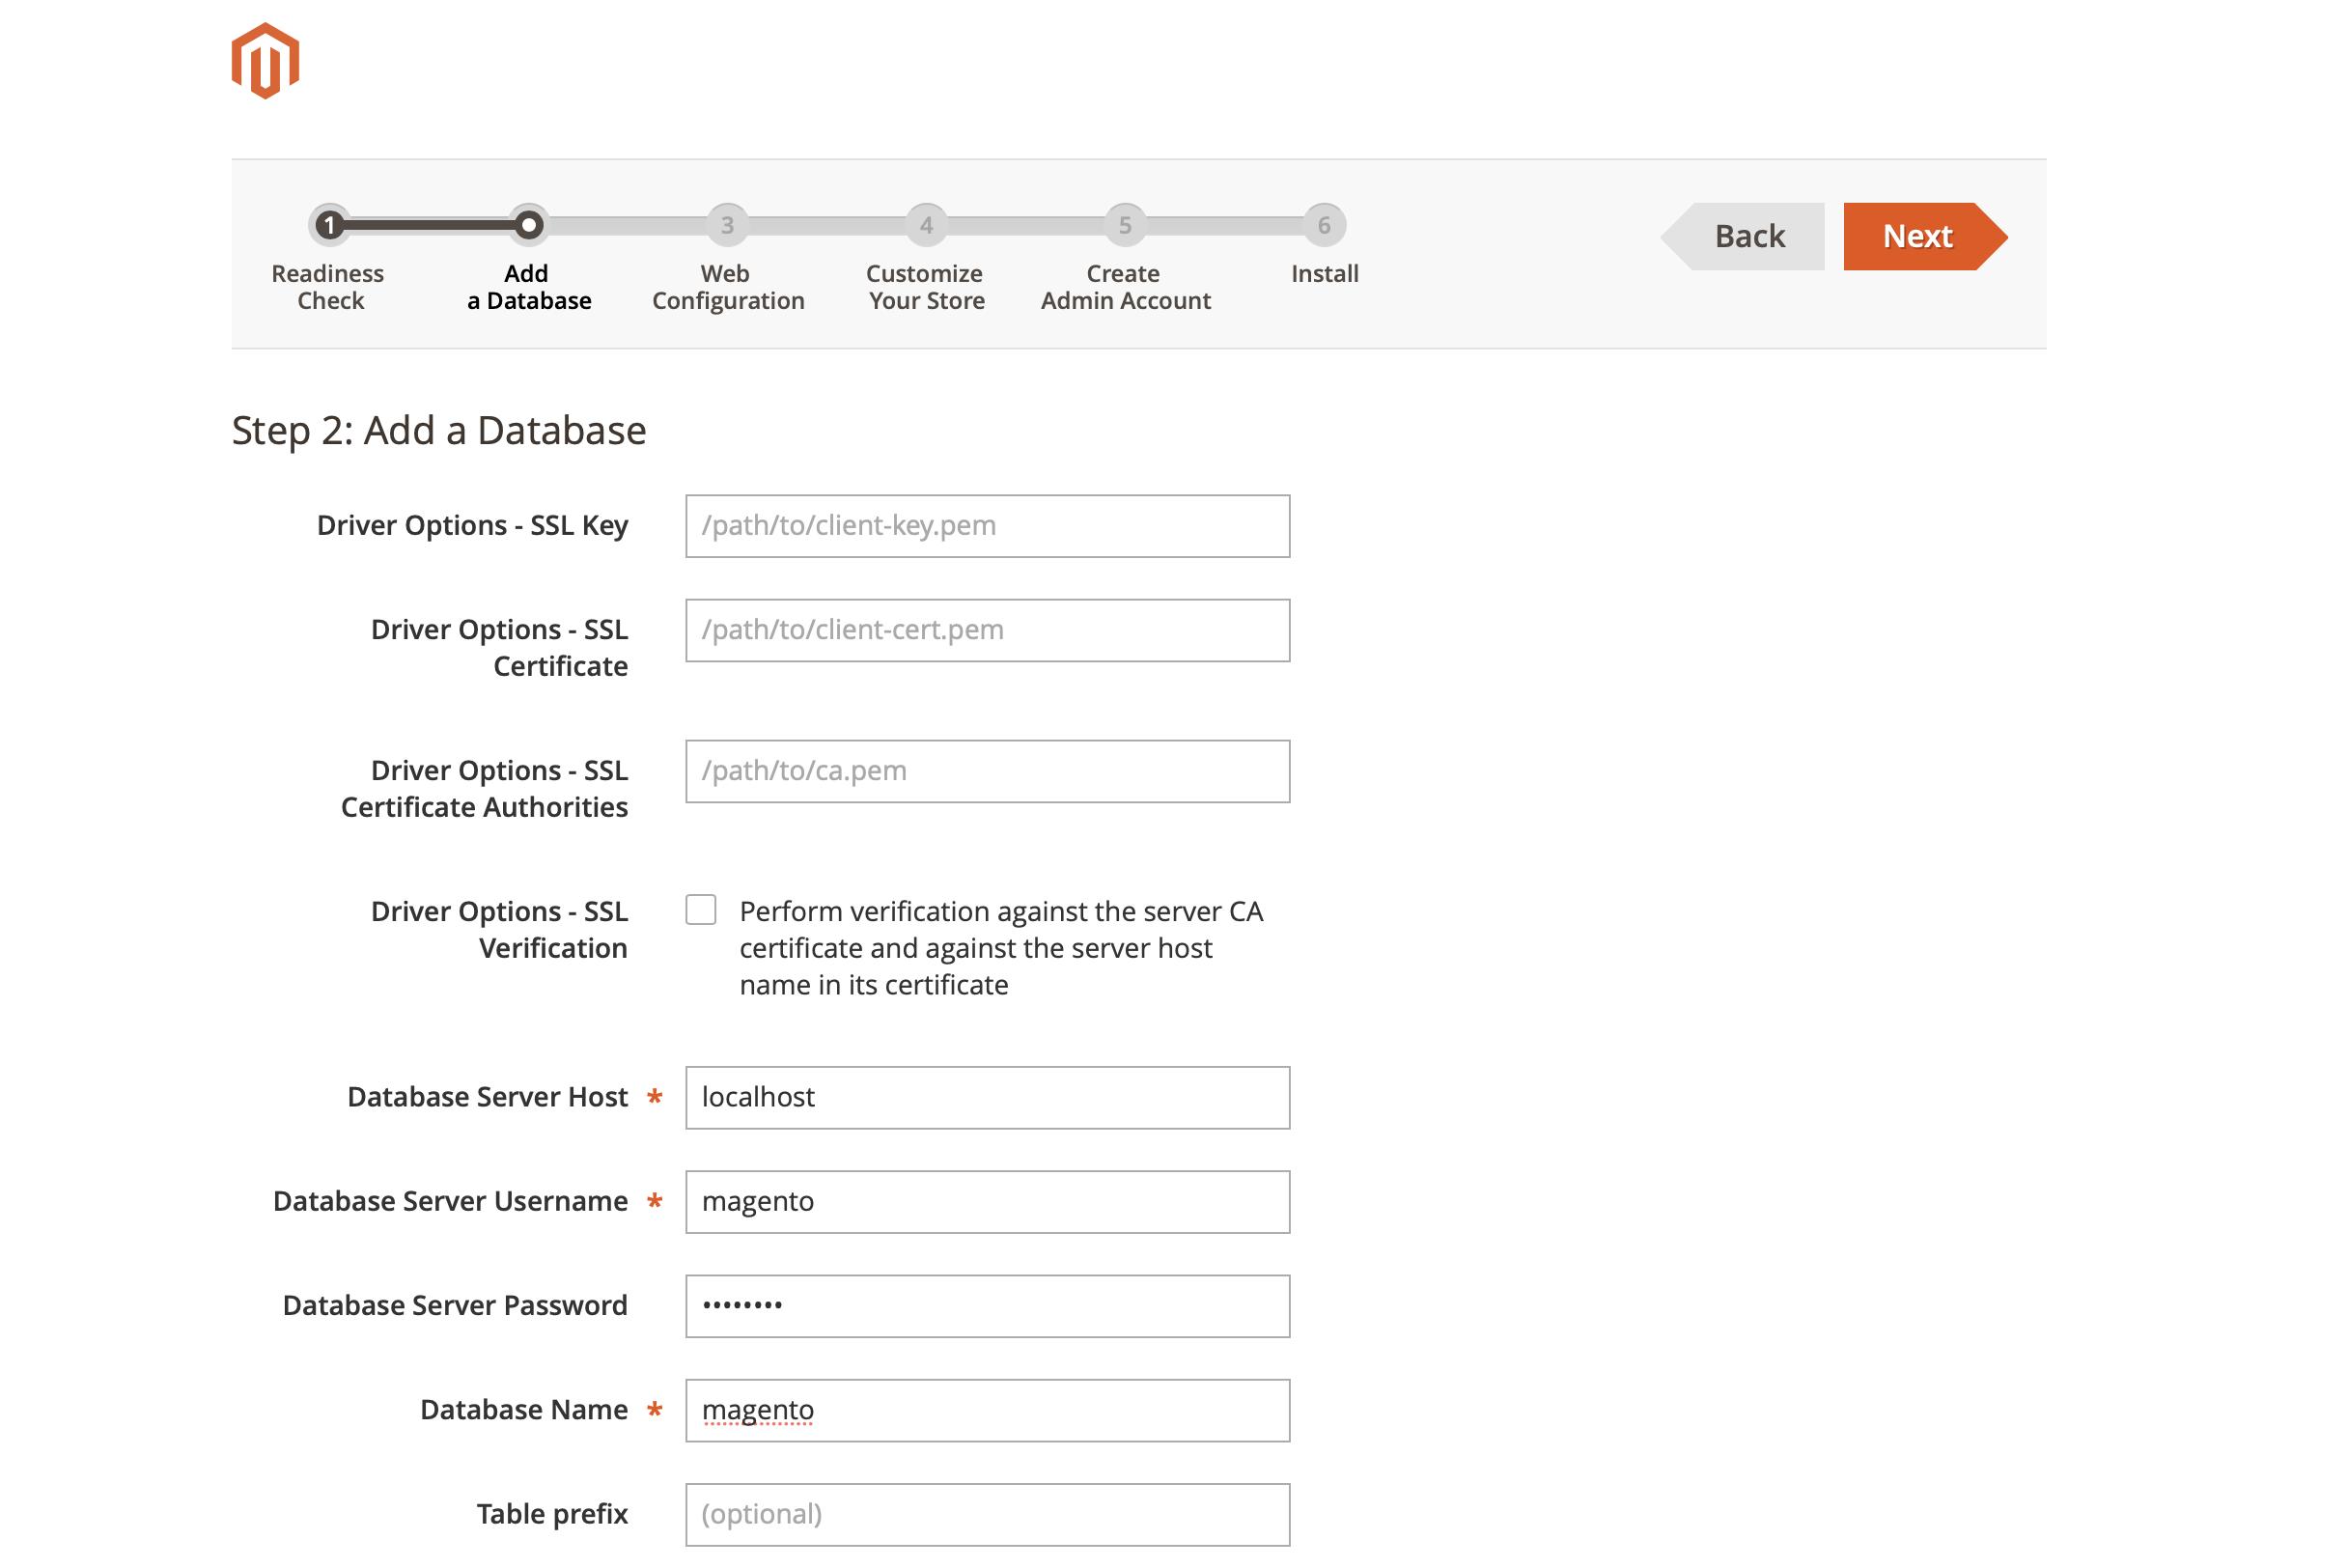 Magento Installation Wizard: Add Database